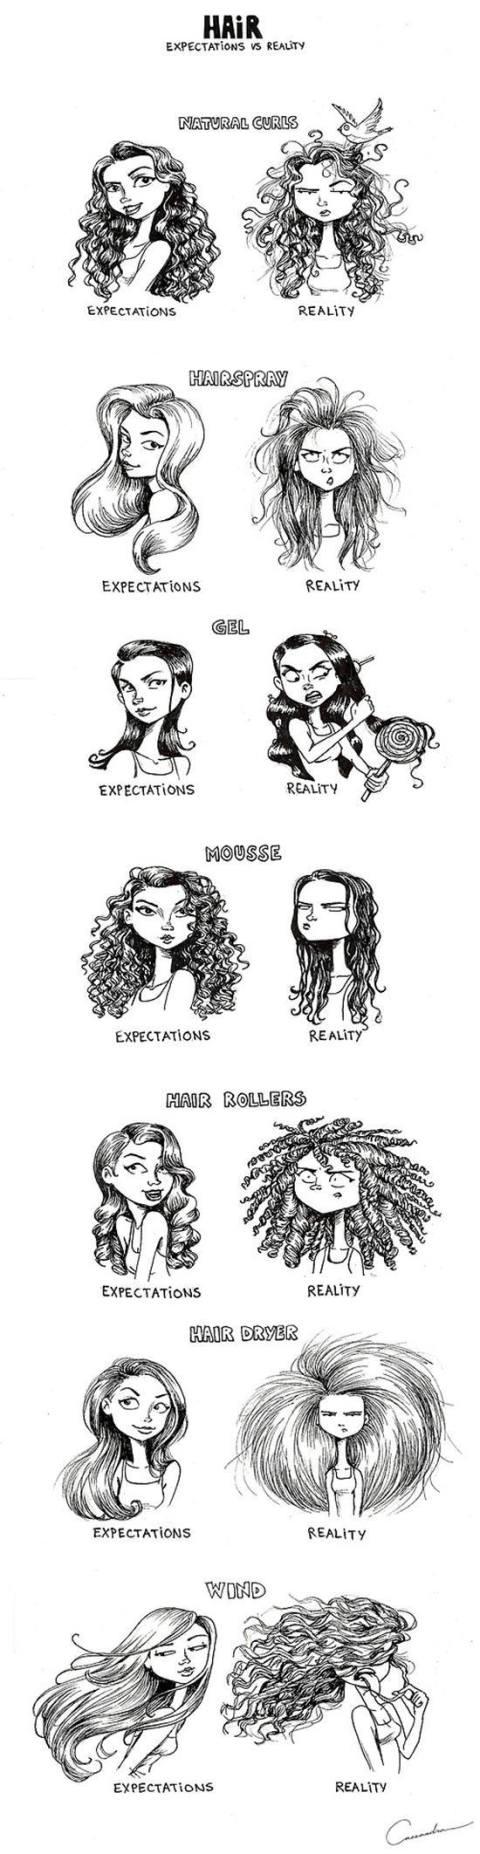 Girl thing beauty struggle expectation reality LoloableStuff blog